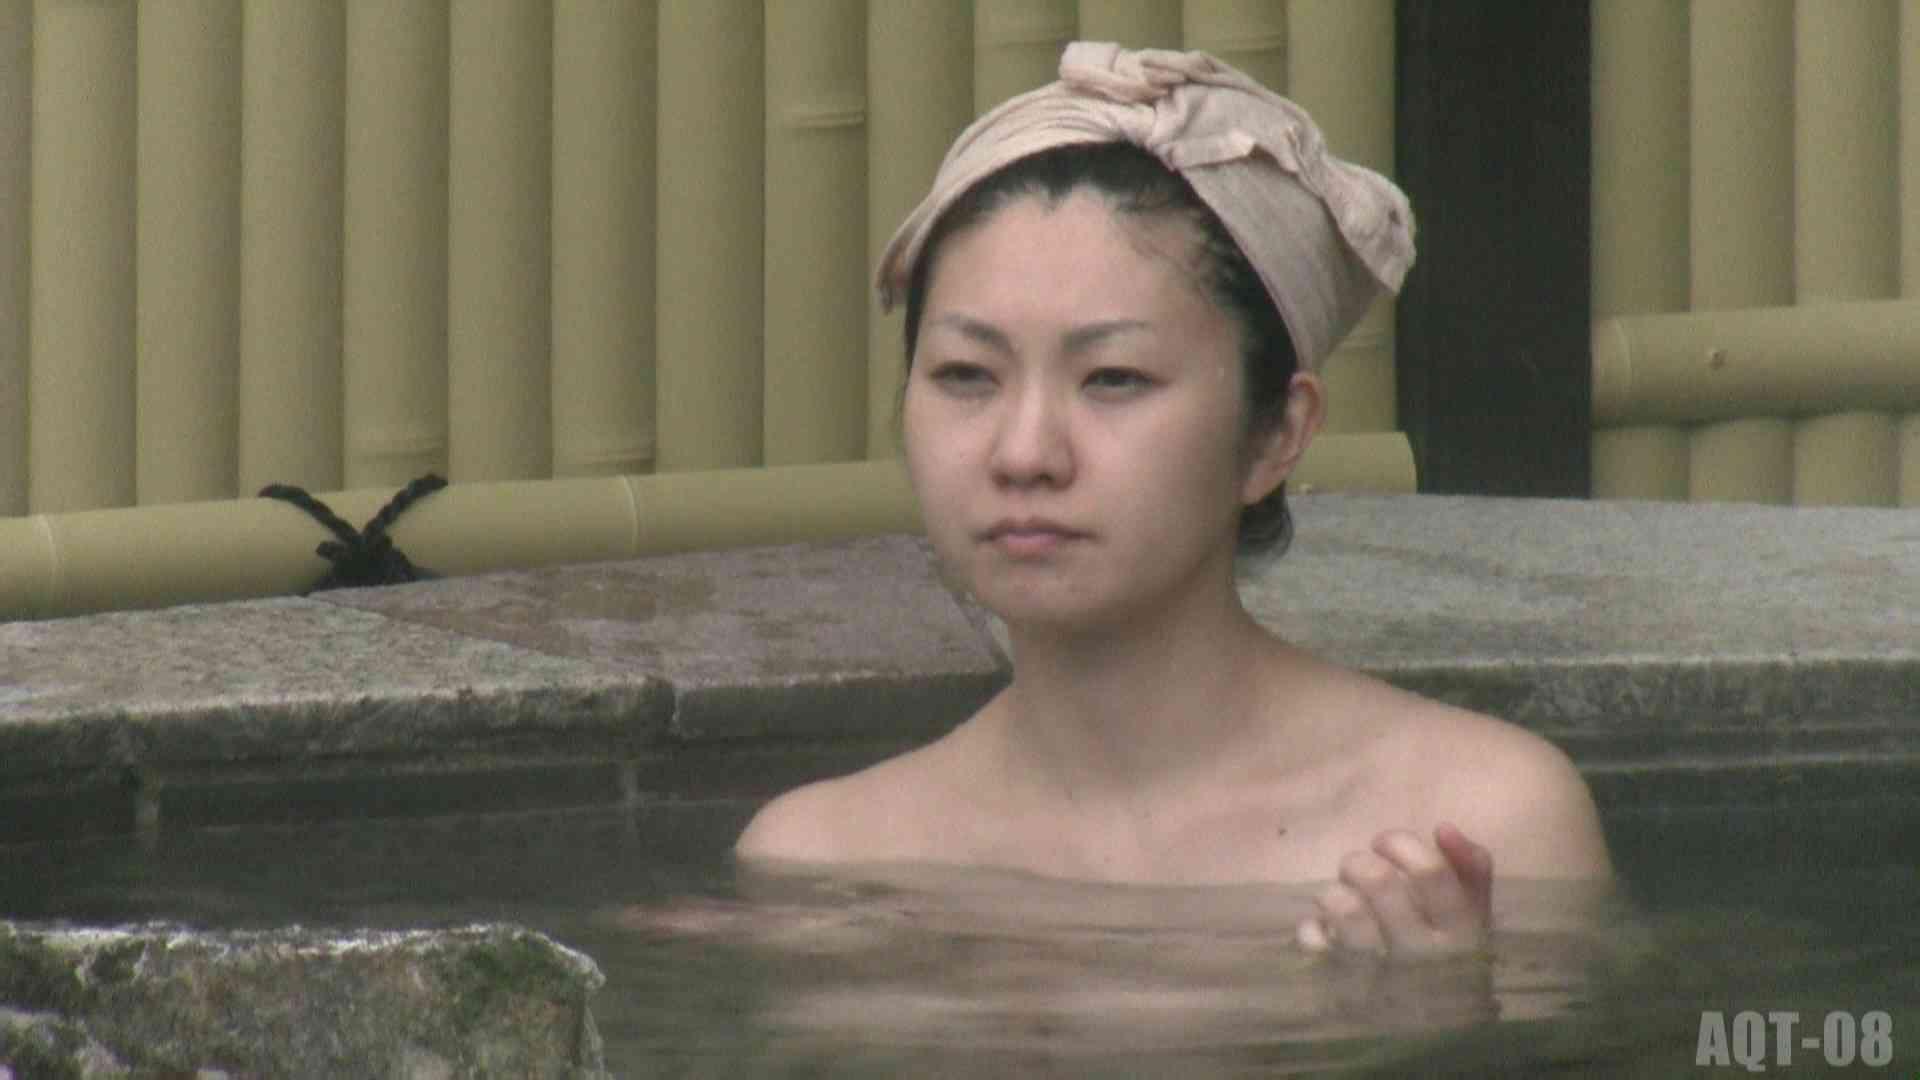 Aquaな露天風呂Vol.772 OL女体  39連発 3